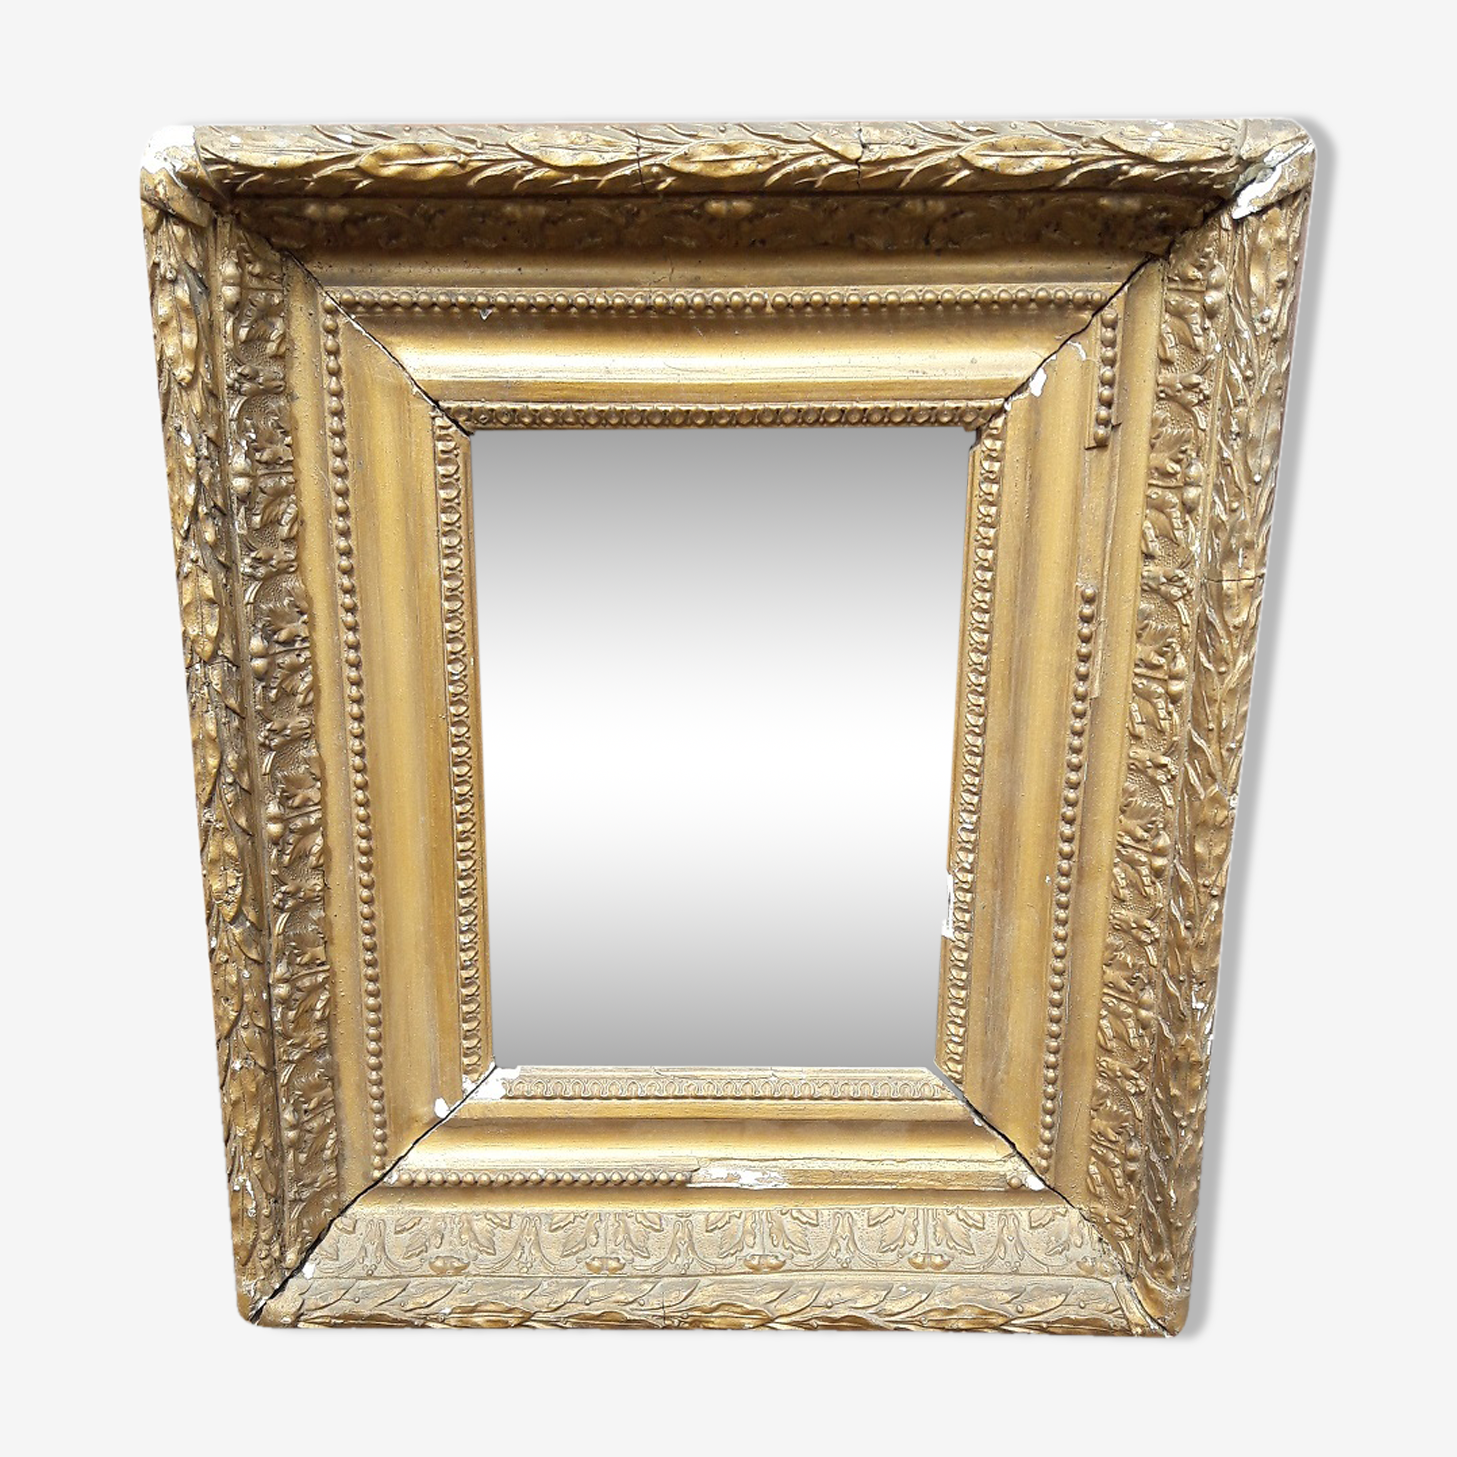 Miroir barbizon ep Napoleon III 36/31cm